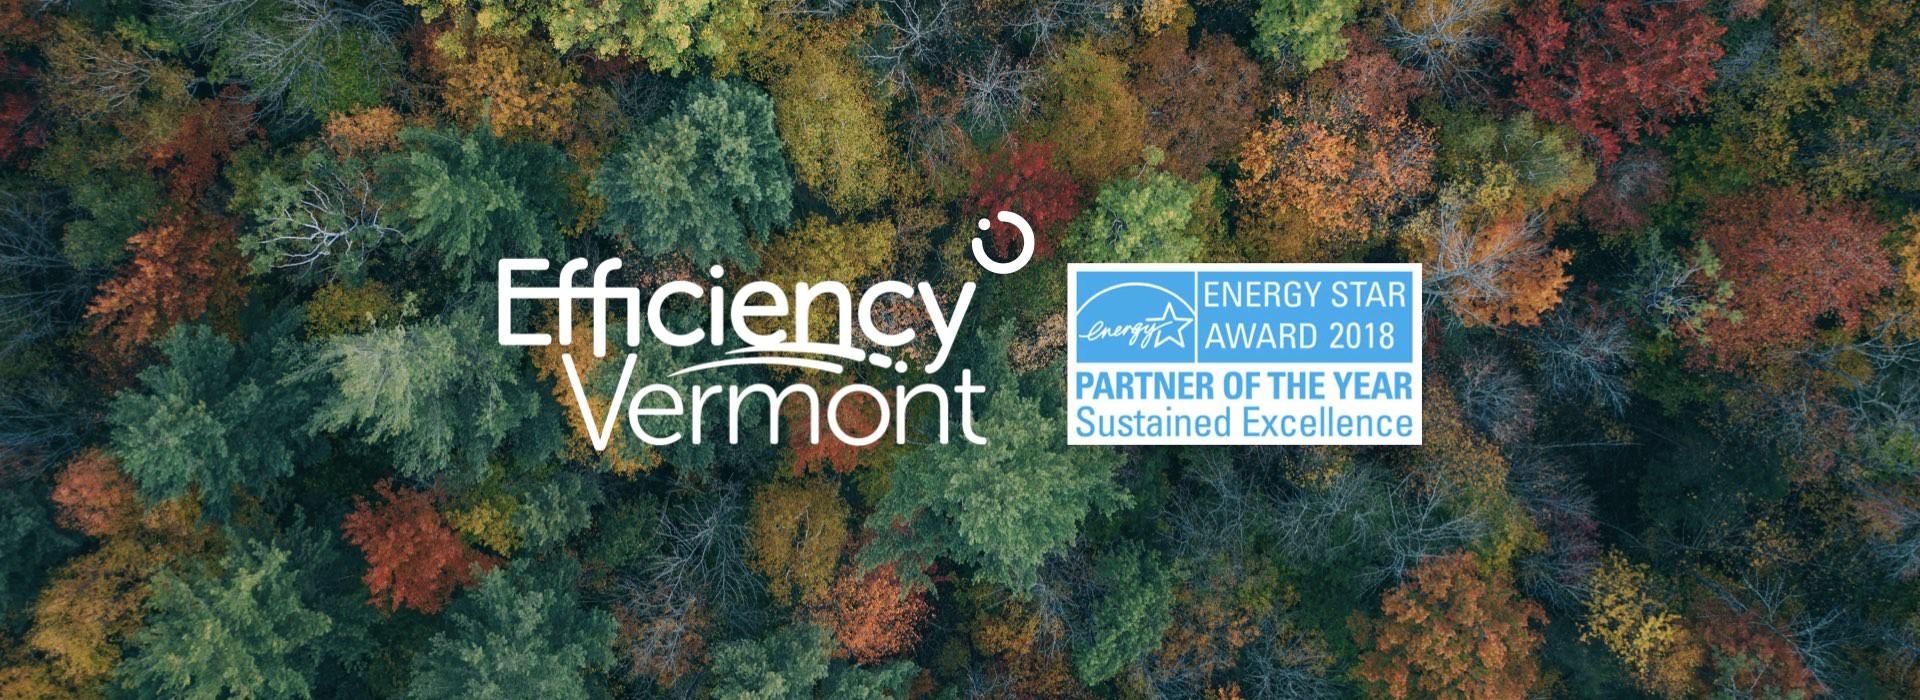 Efficiency Vermont Marketplace Helps Enervee Partner Garner ENERGY STAR Award